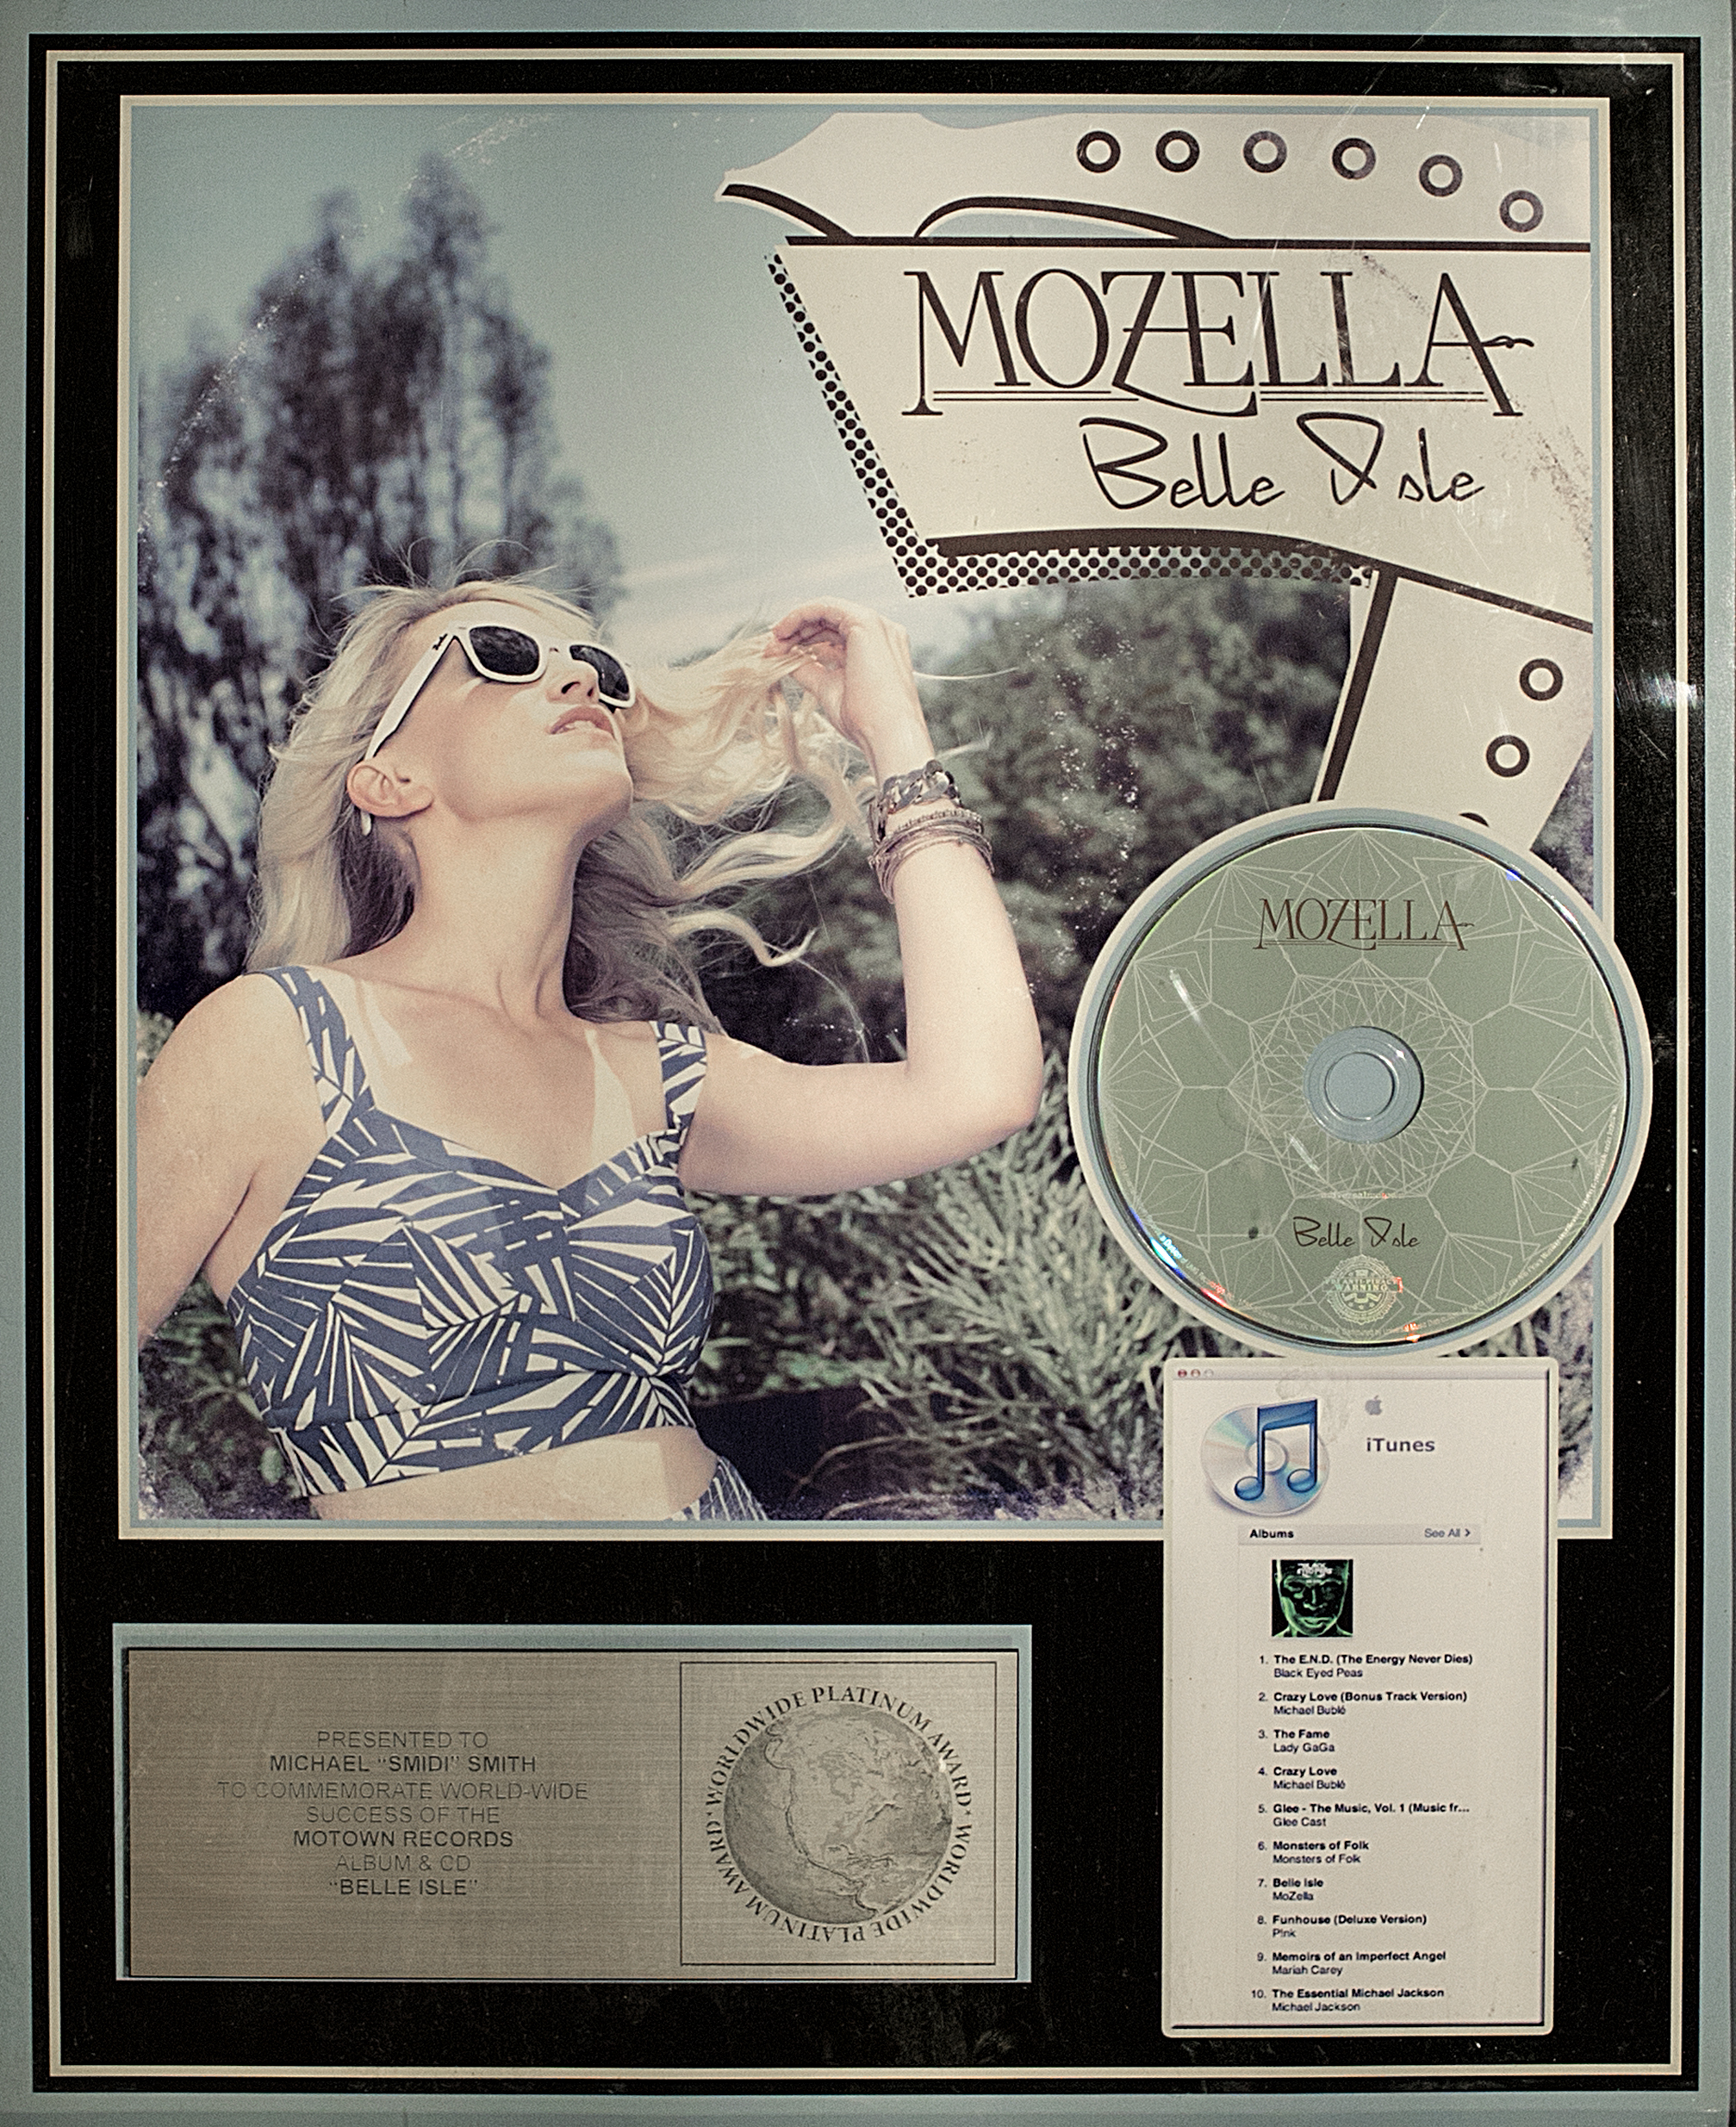 Mozella_DSC01495.jpg